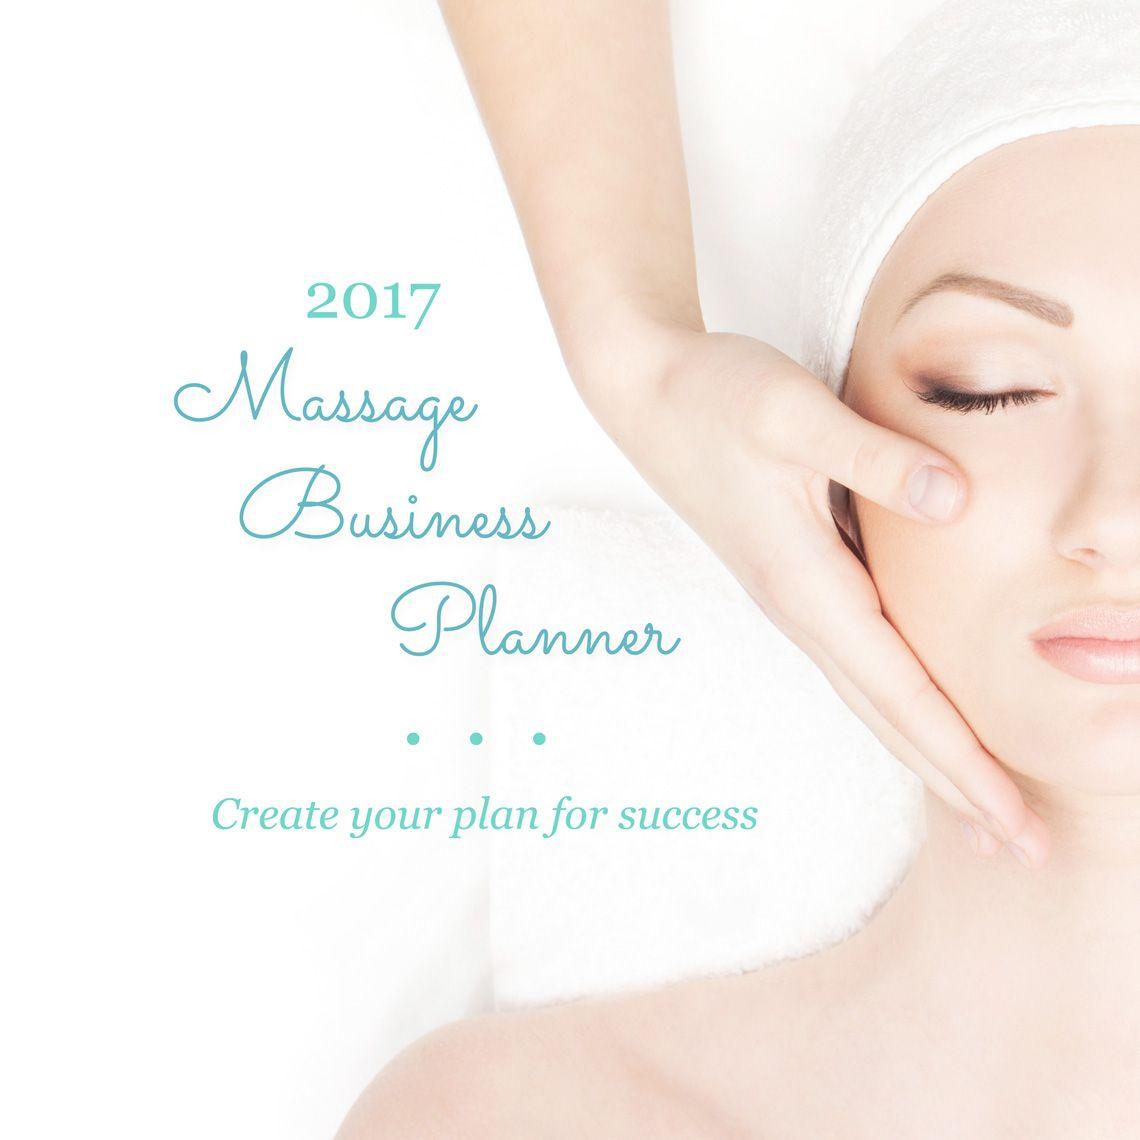 undefined Massage business, Spa massage, Massage